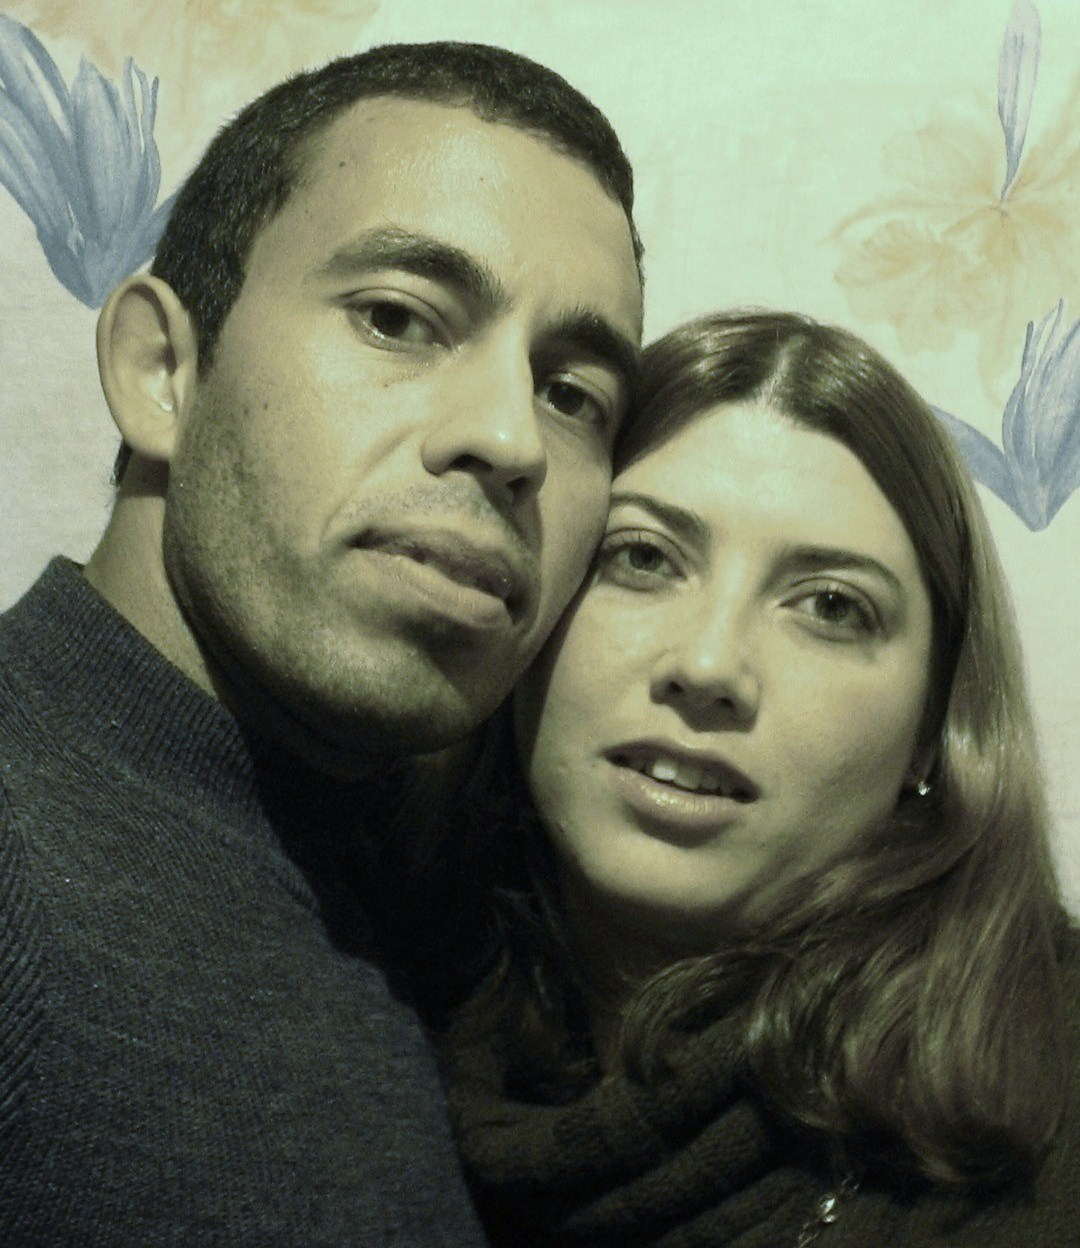 [Cópia+de+Cópia+de+Luviano+e+Fabiana+019.jpg]